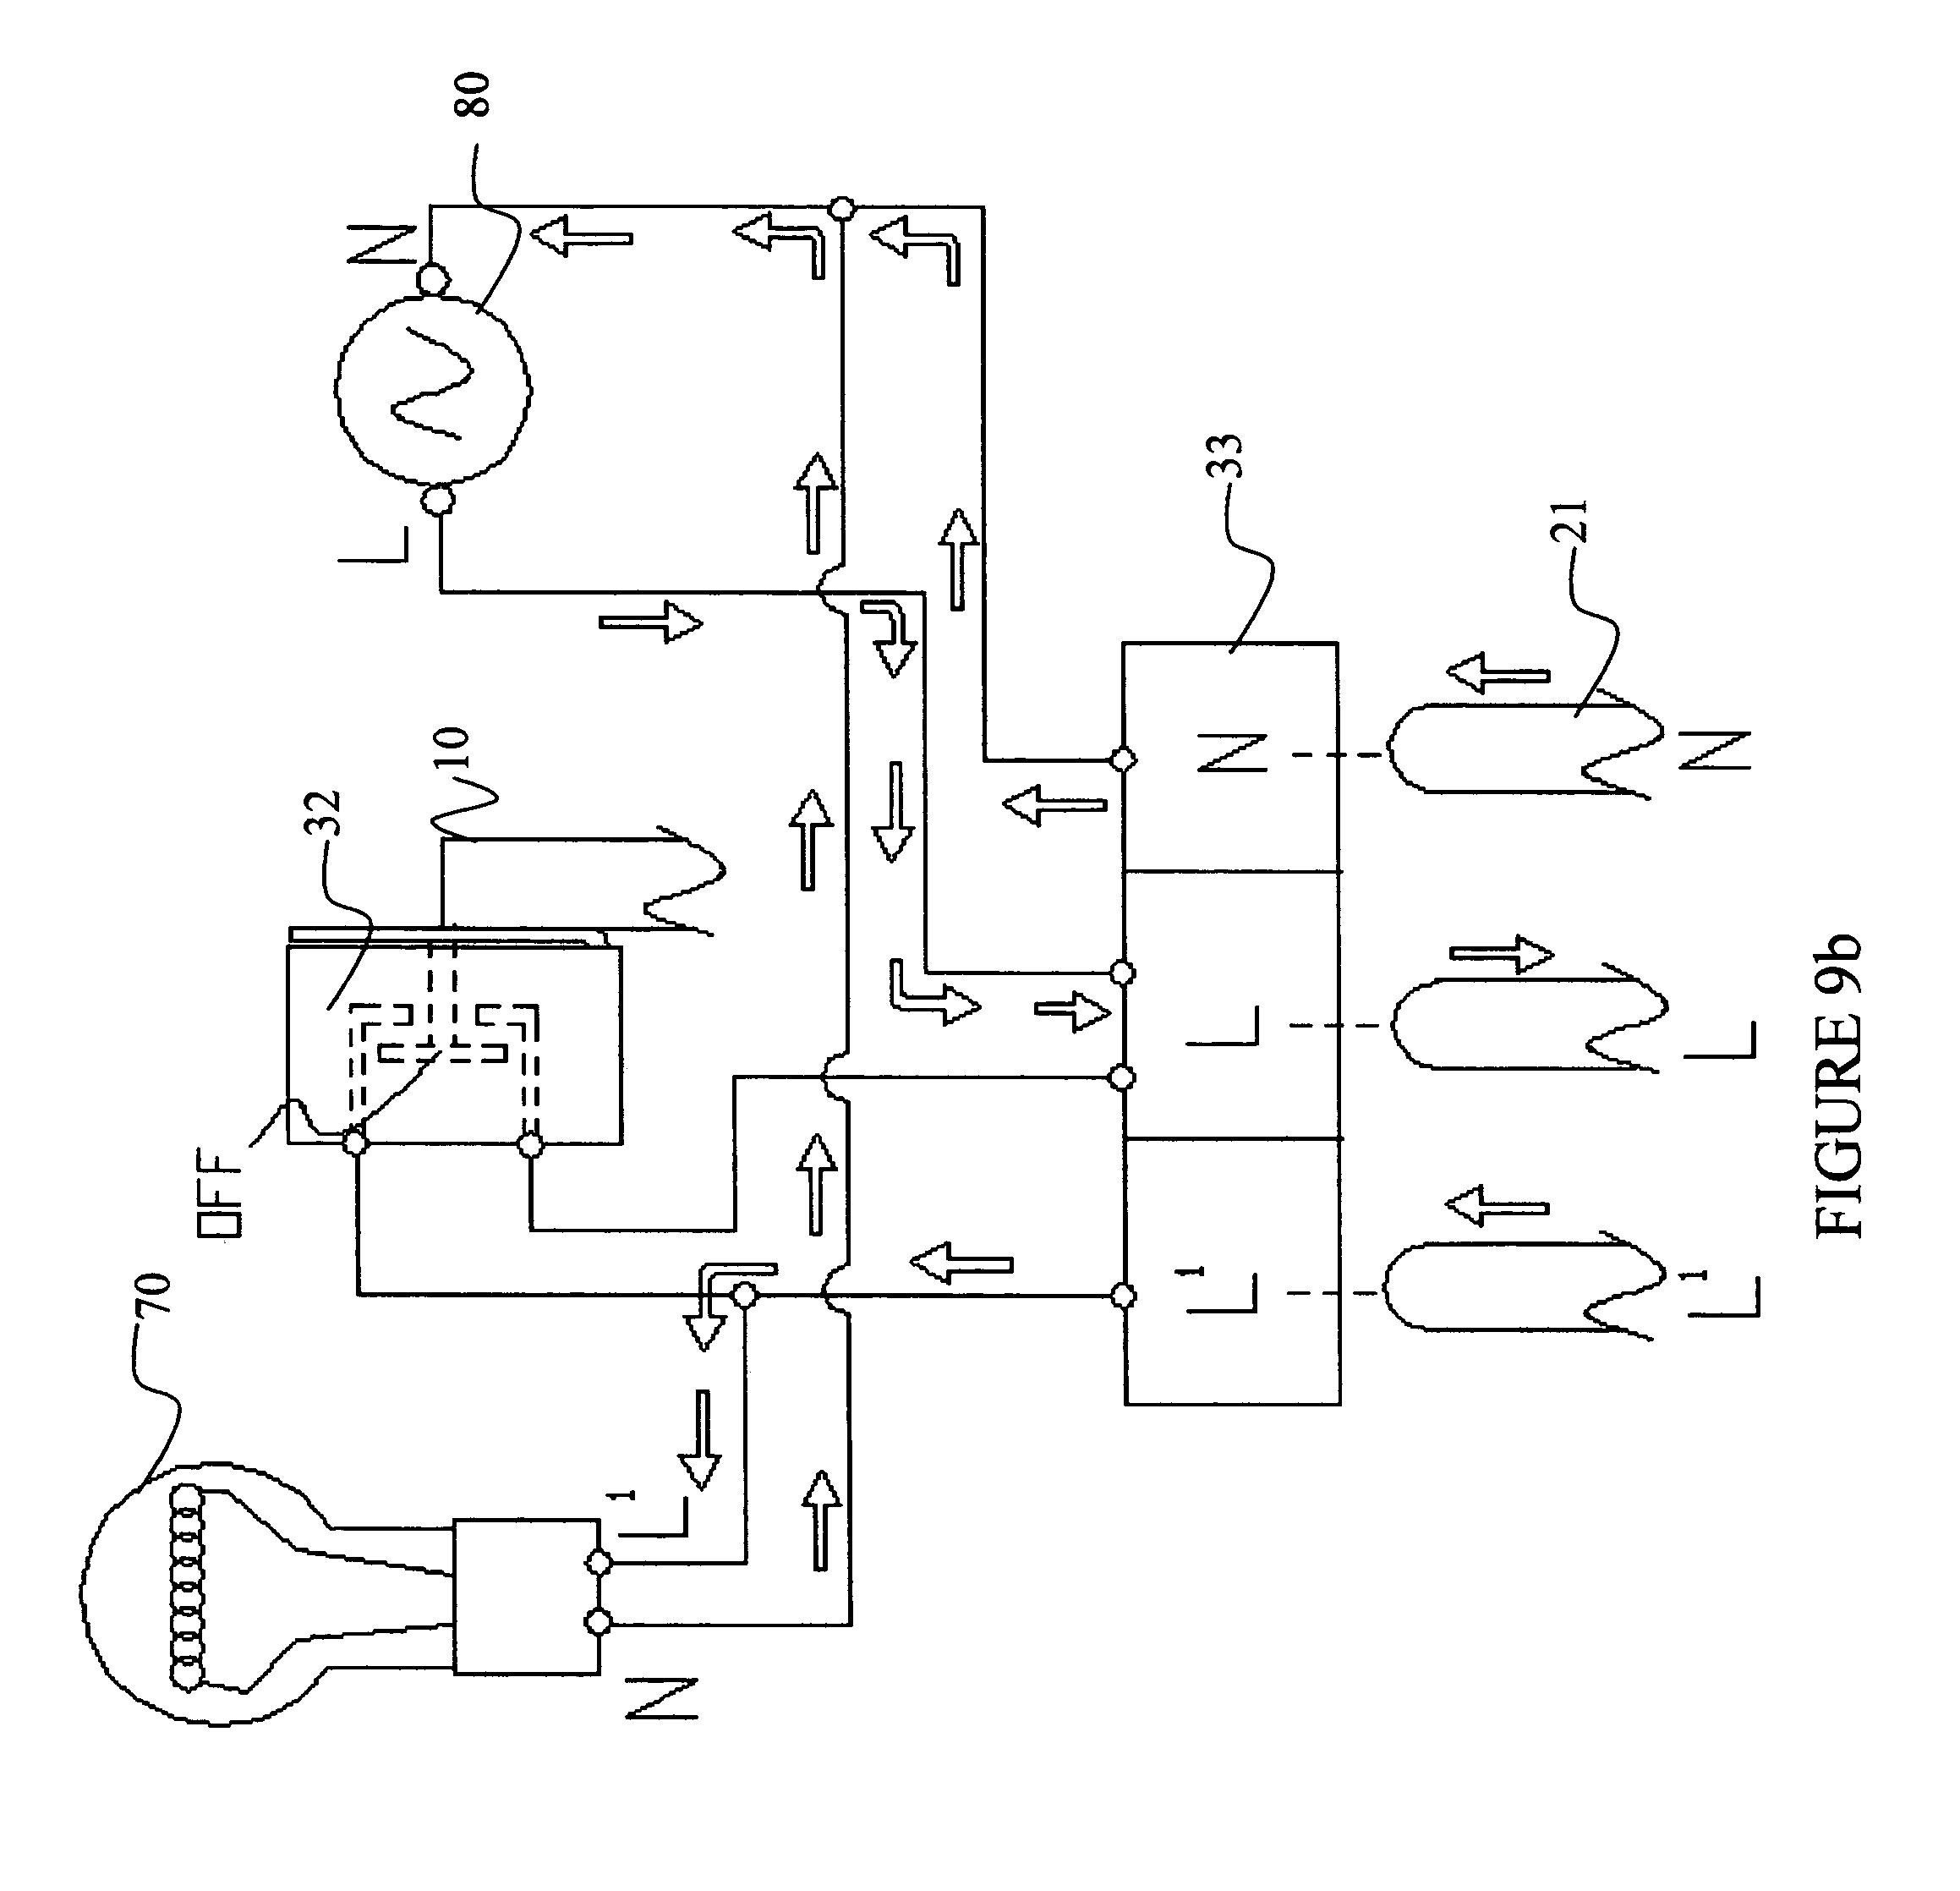 Motion Sensor Wiring Instructions